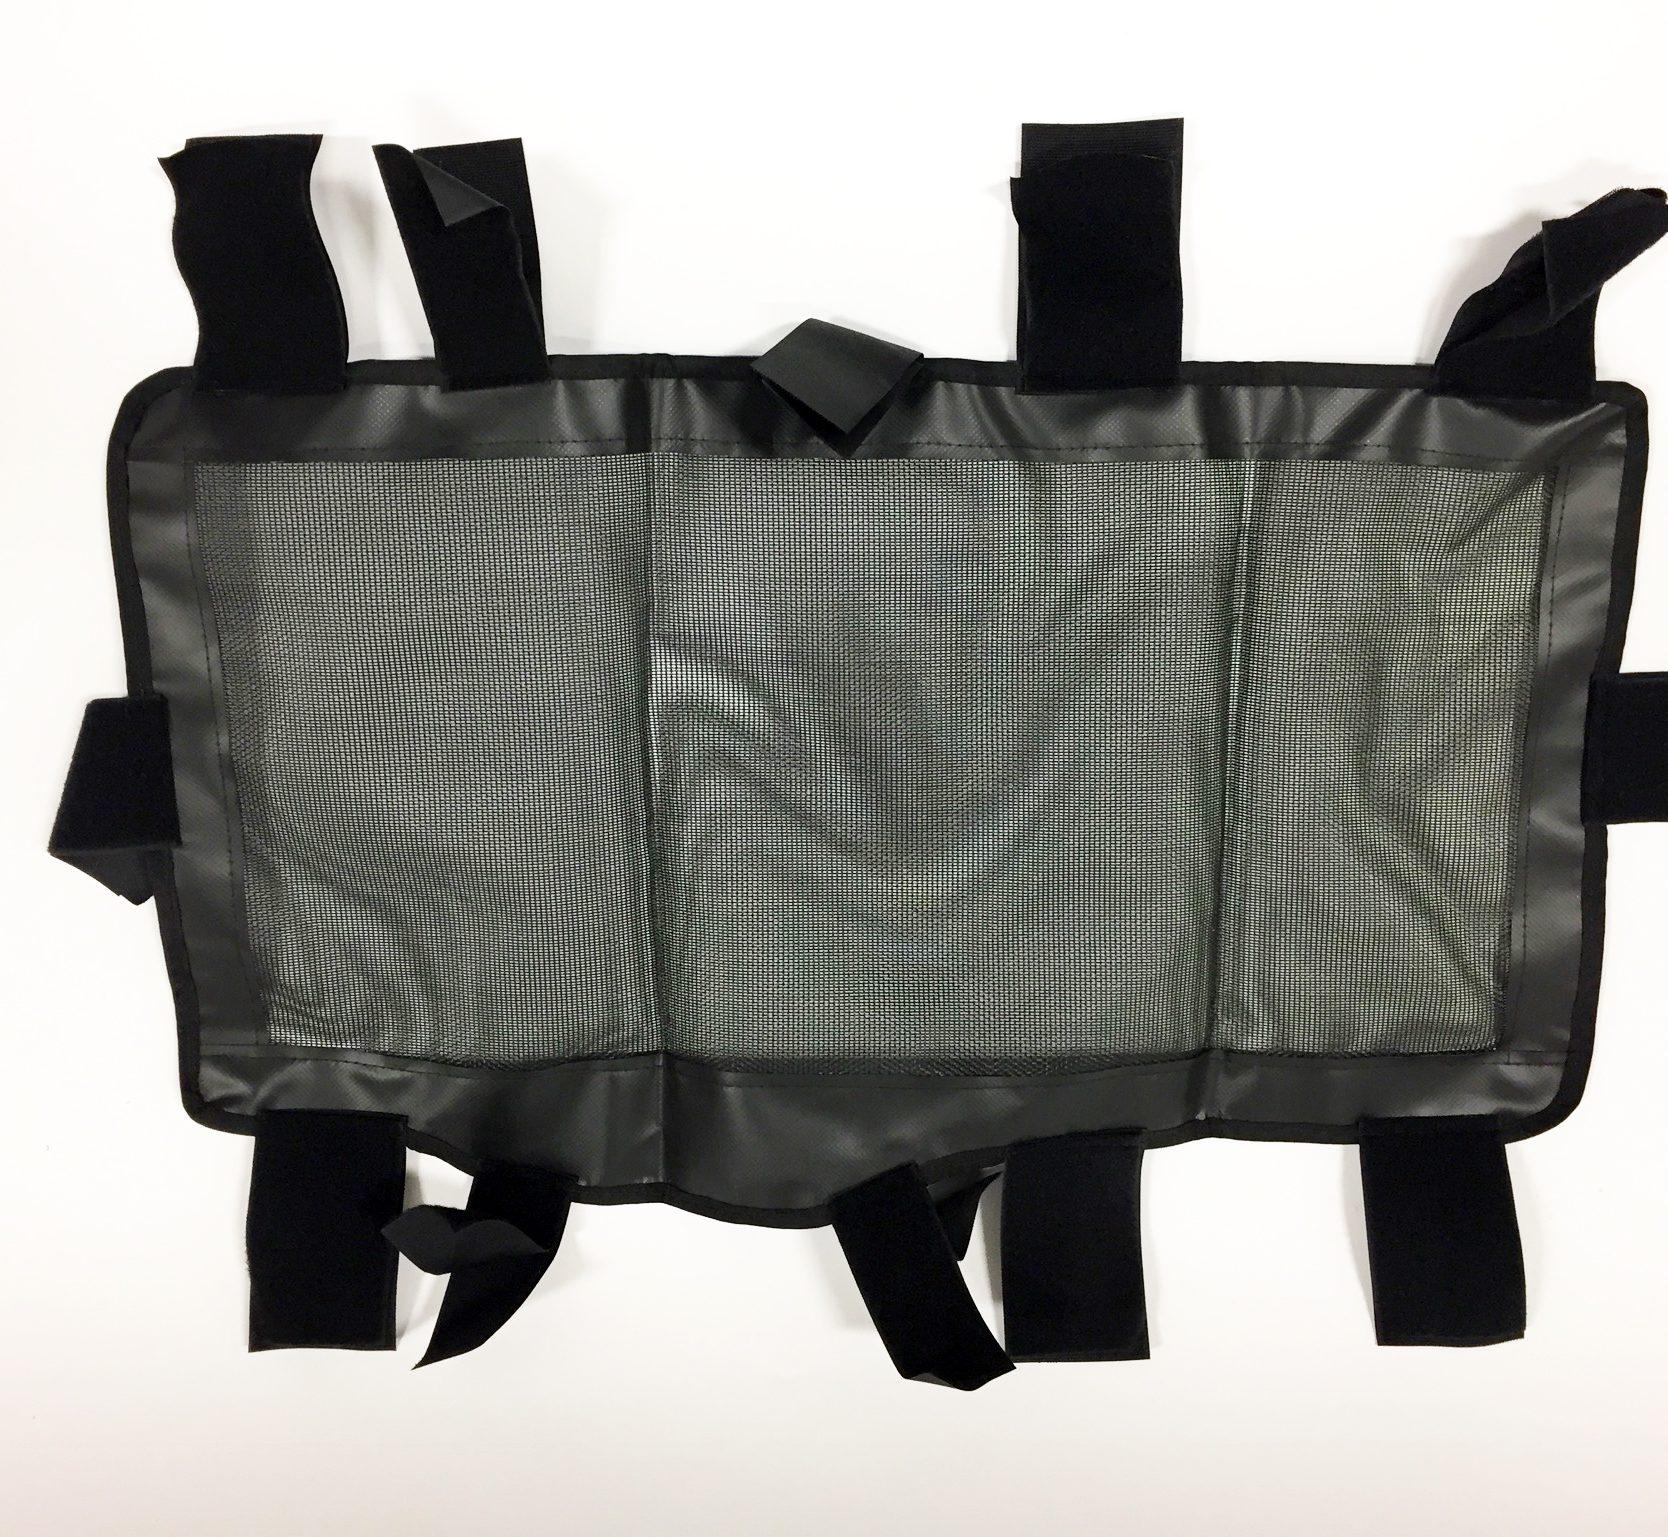 evac chair canada long sofa 93p accessory lower tray mesh  ferno